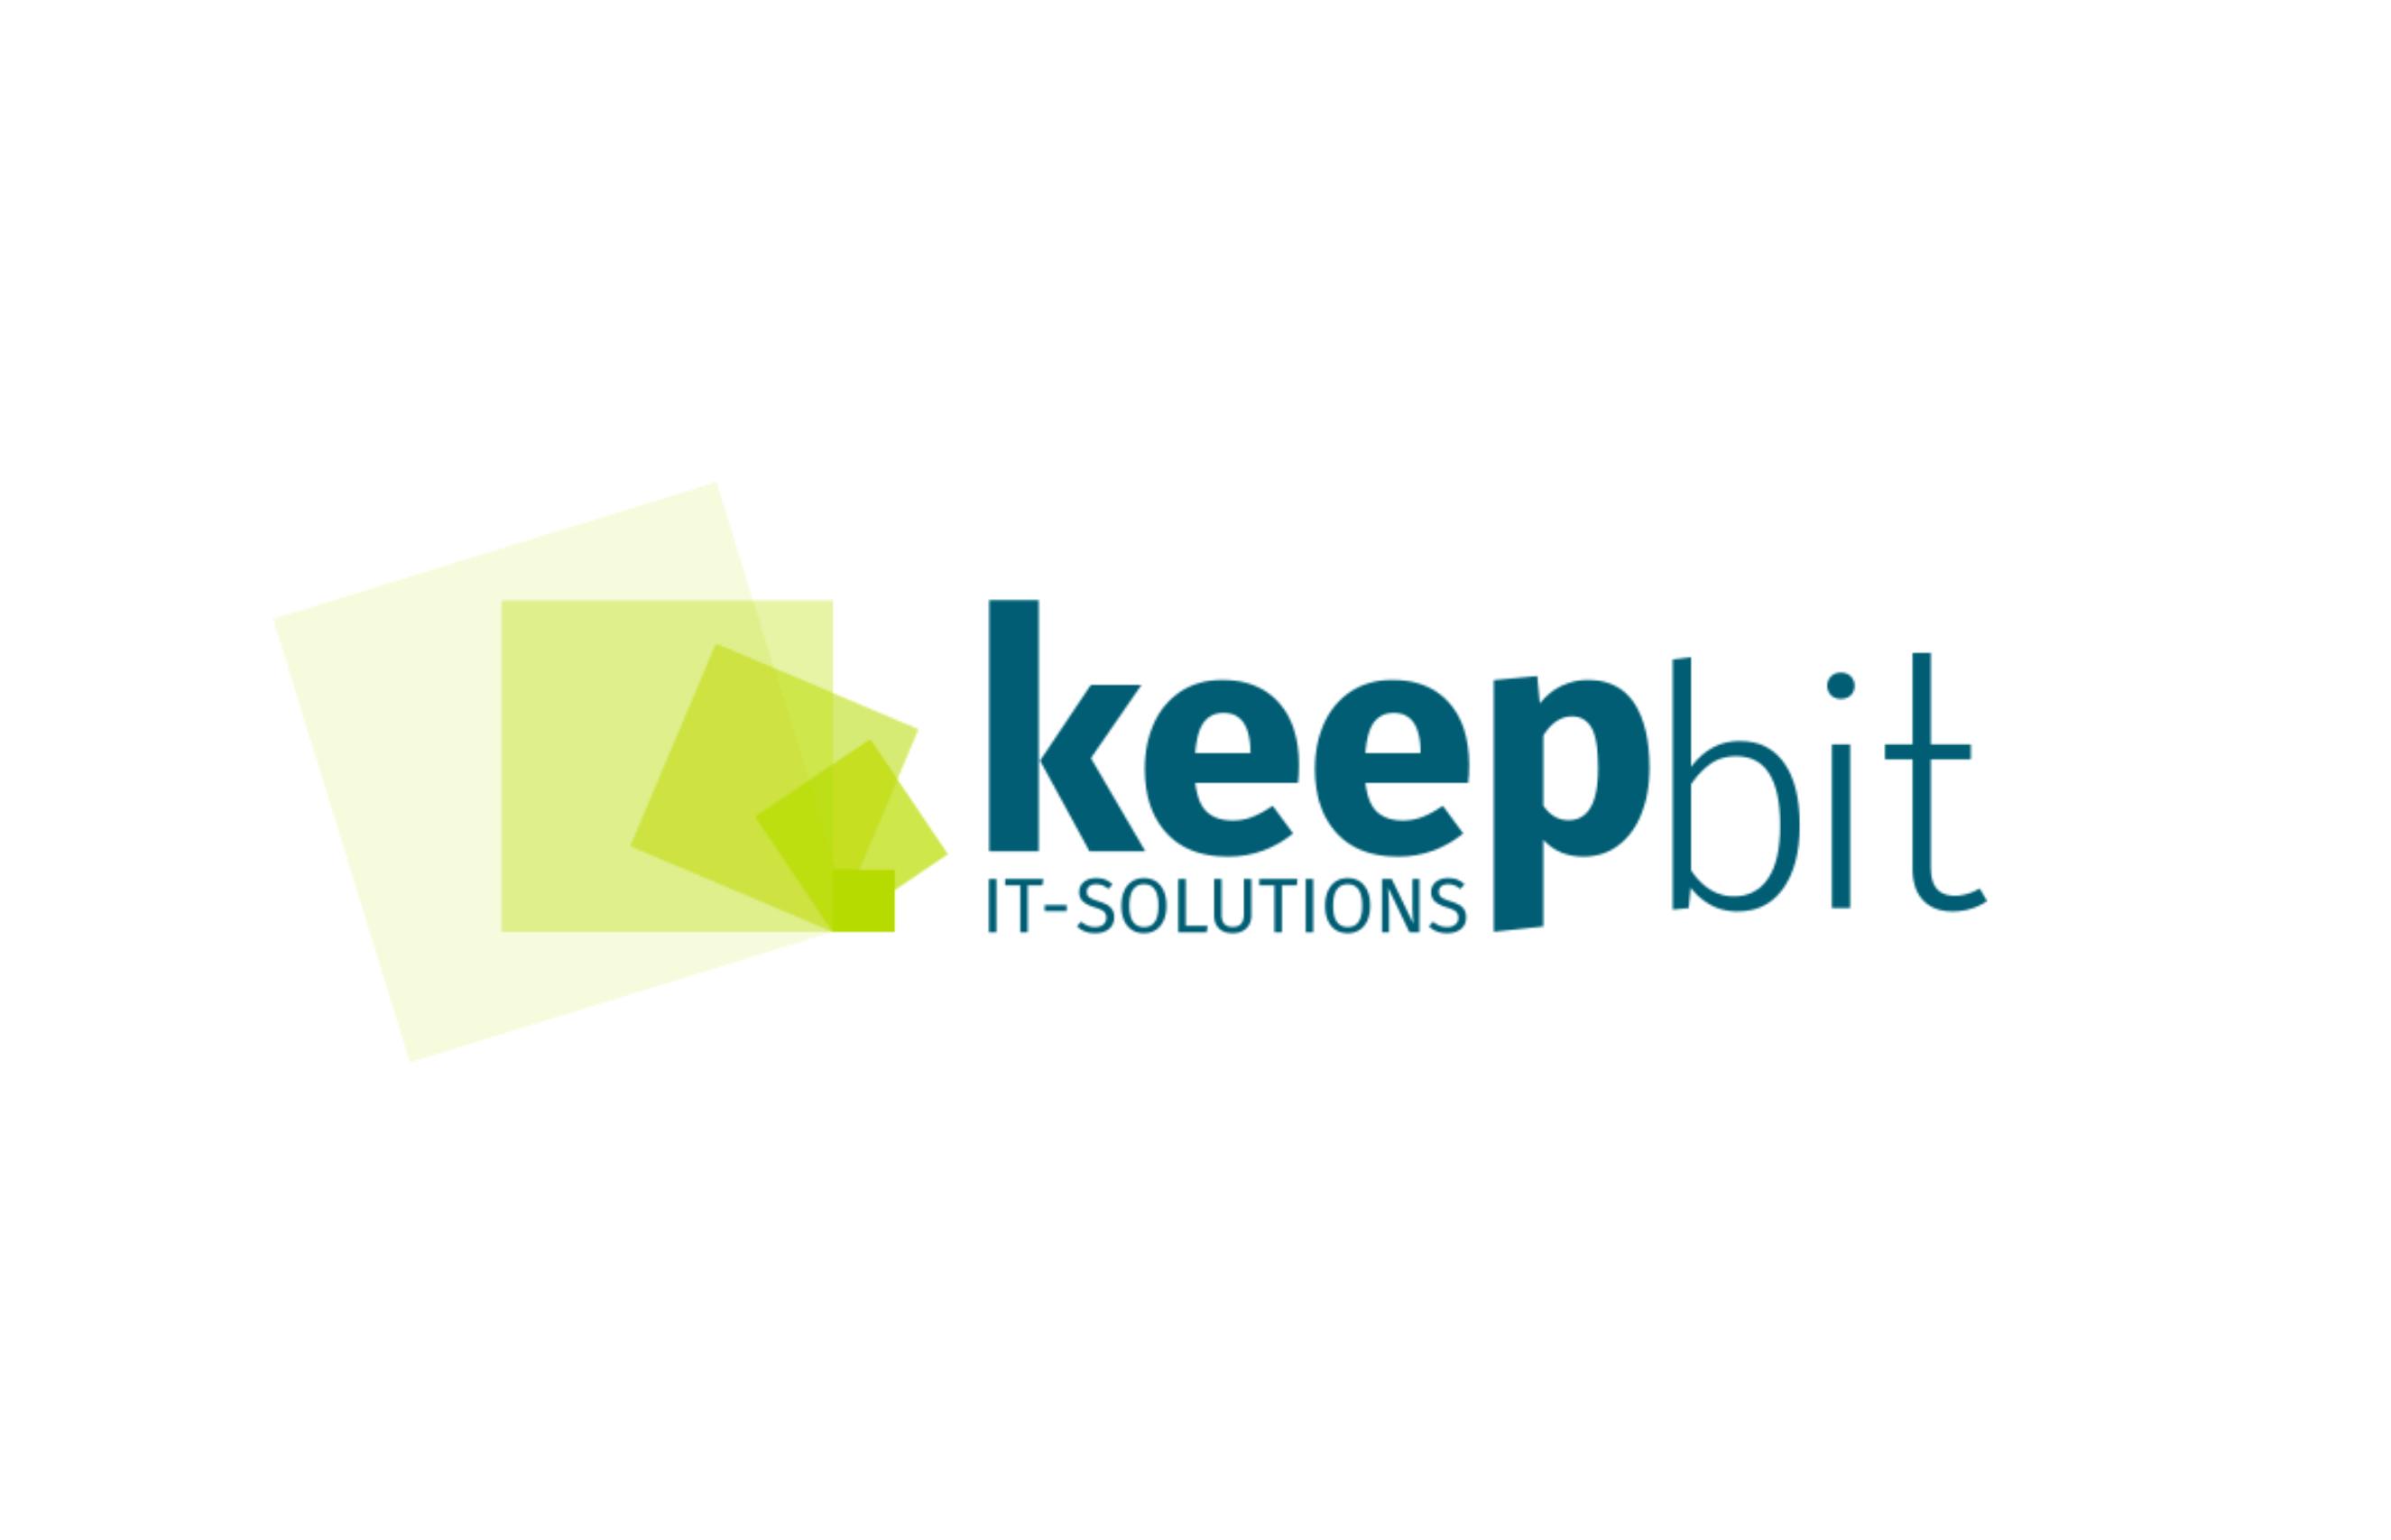 Keepbit IT-SOLUTIONS